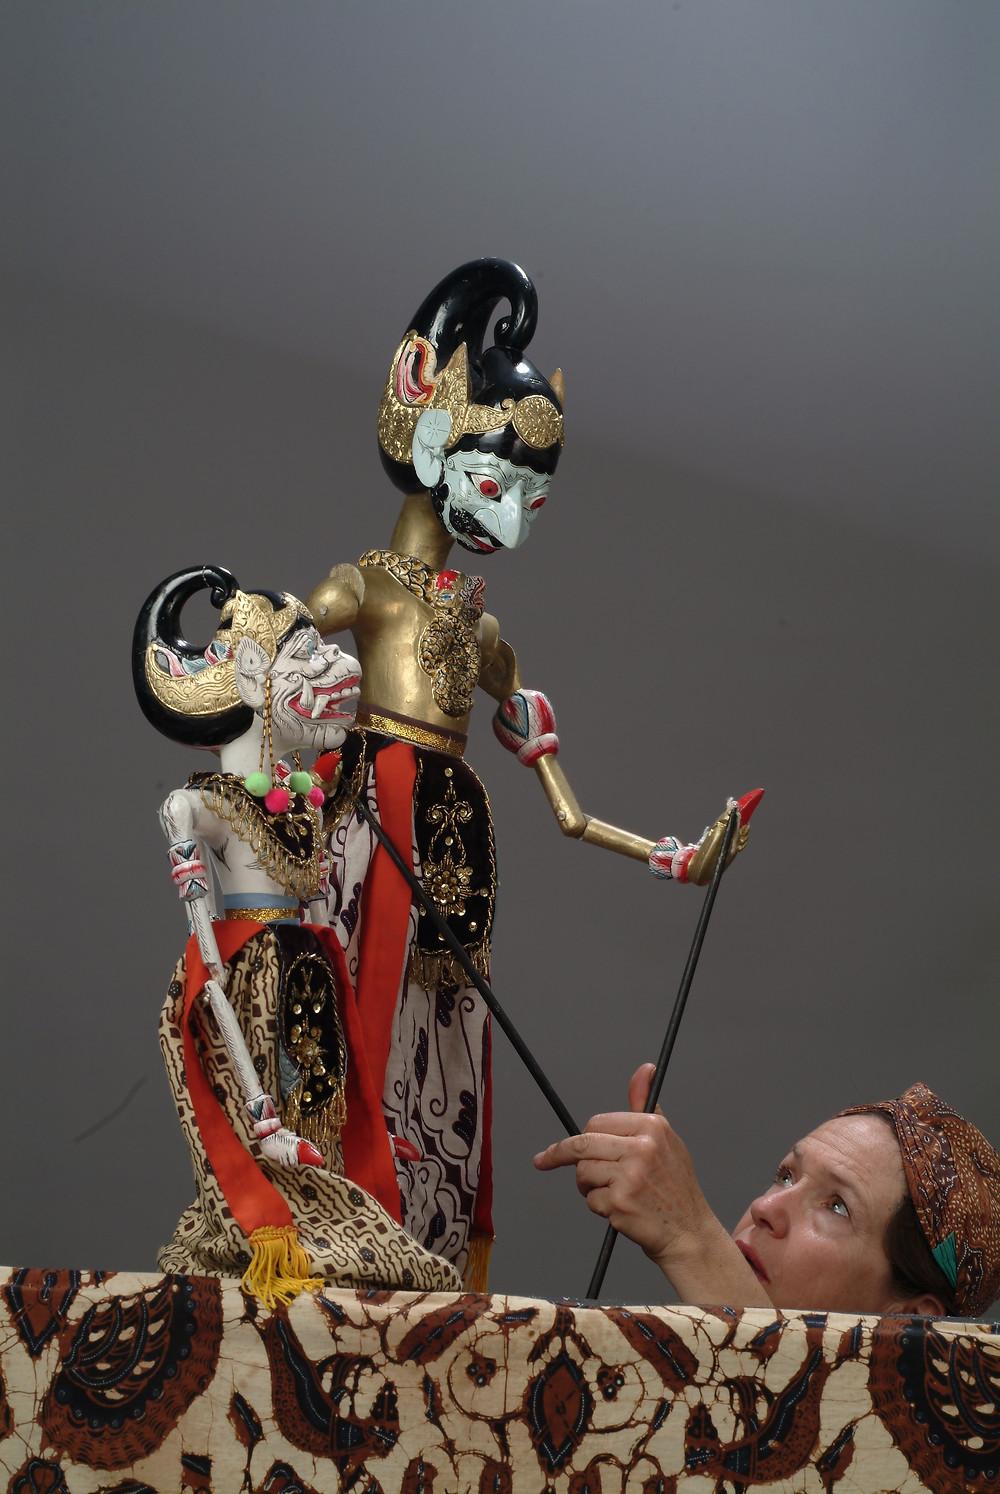 The Wind god will help Hanuman cross the sea to Alenka